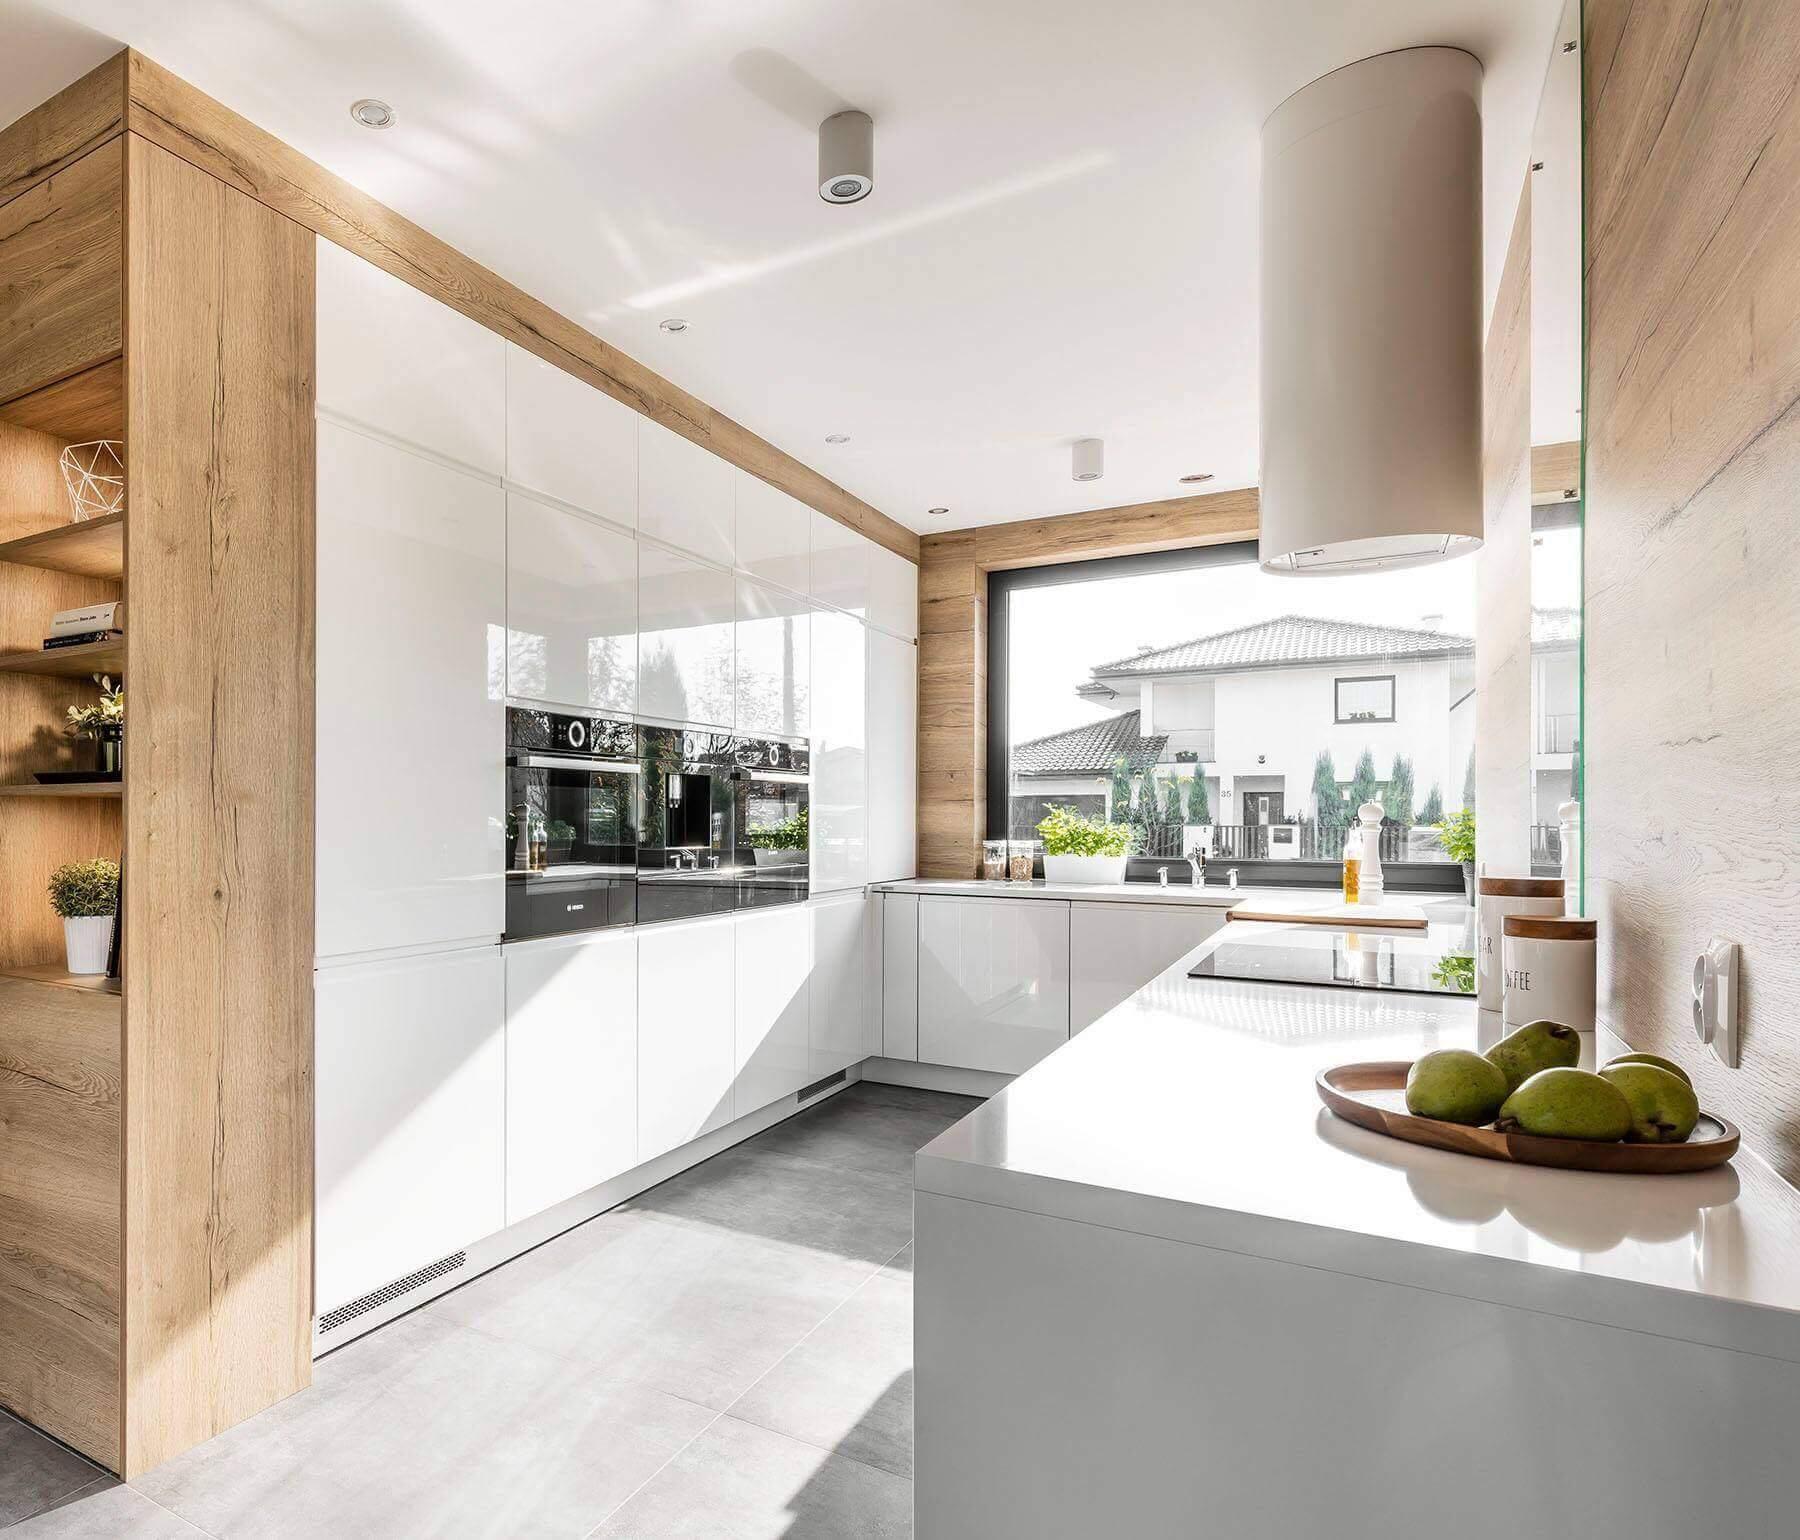 Baster Kuchnie – Firmowe Studio WFM Kuchnie i Nolte Kuechen